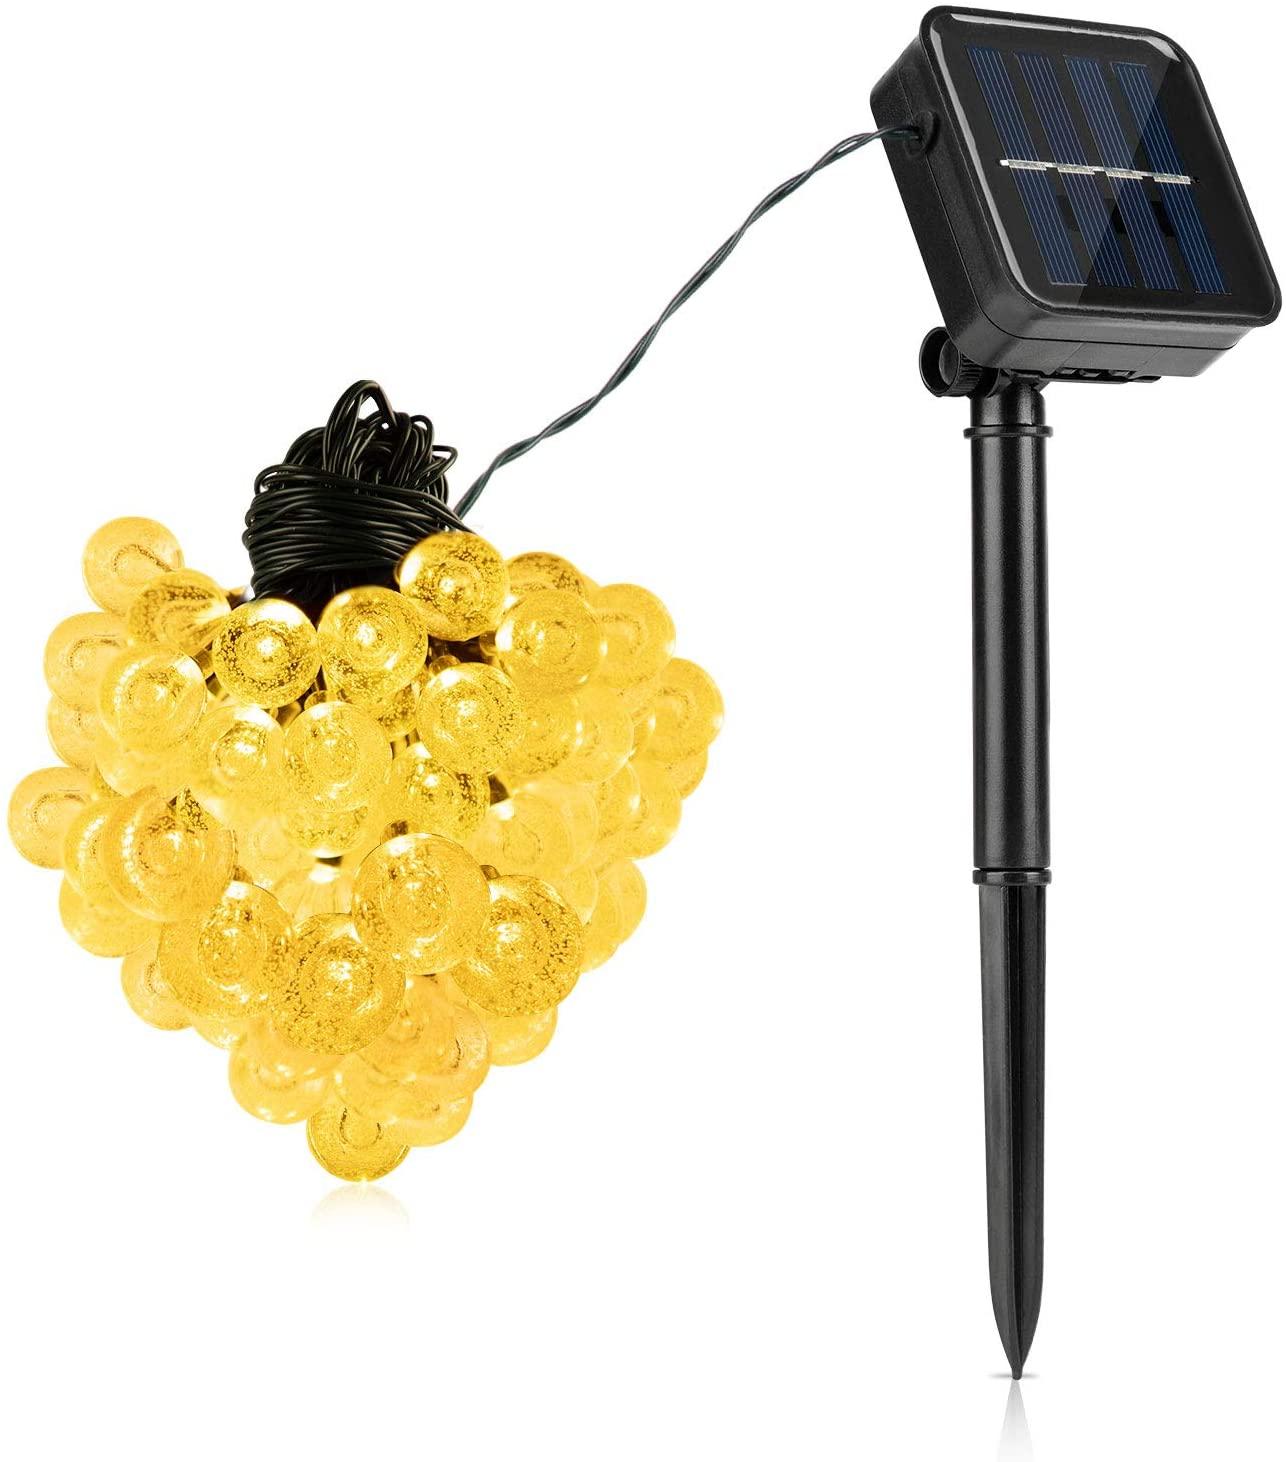 Glob Solar String Lights, 39.4ft 100 LED Outdoor Bulb String Lights,Waterproof 8 Modes Solar Patio Lights for Patio, Garden, Gazebo, Yard, Outdoors (Warm White)